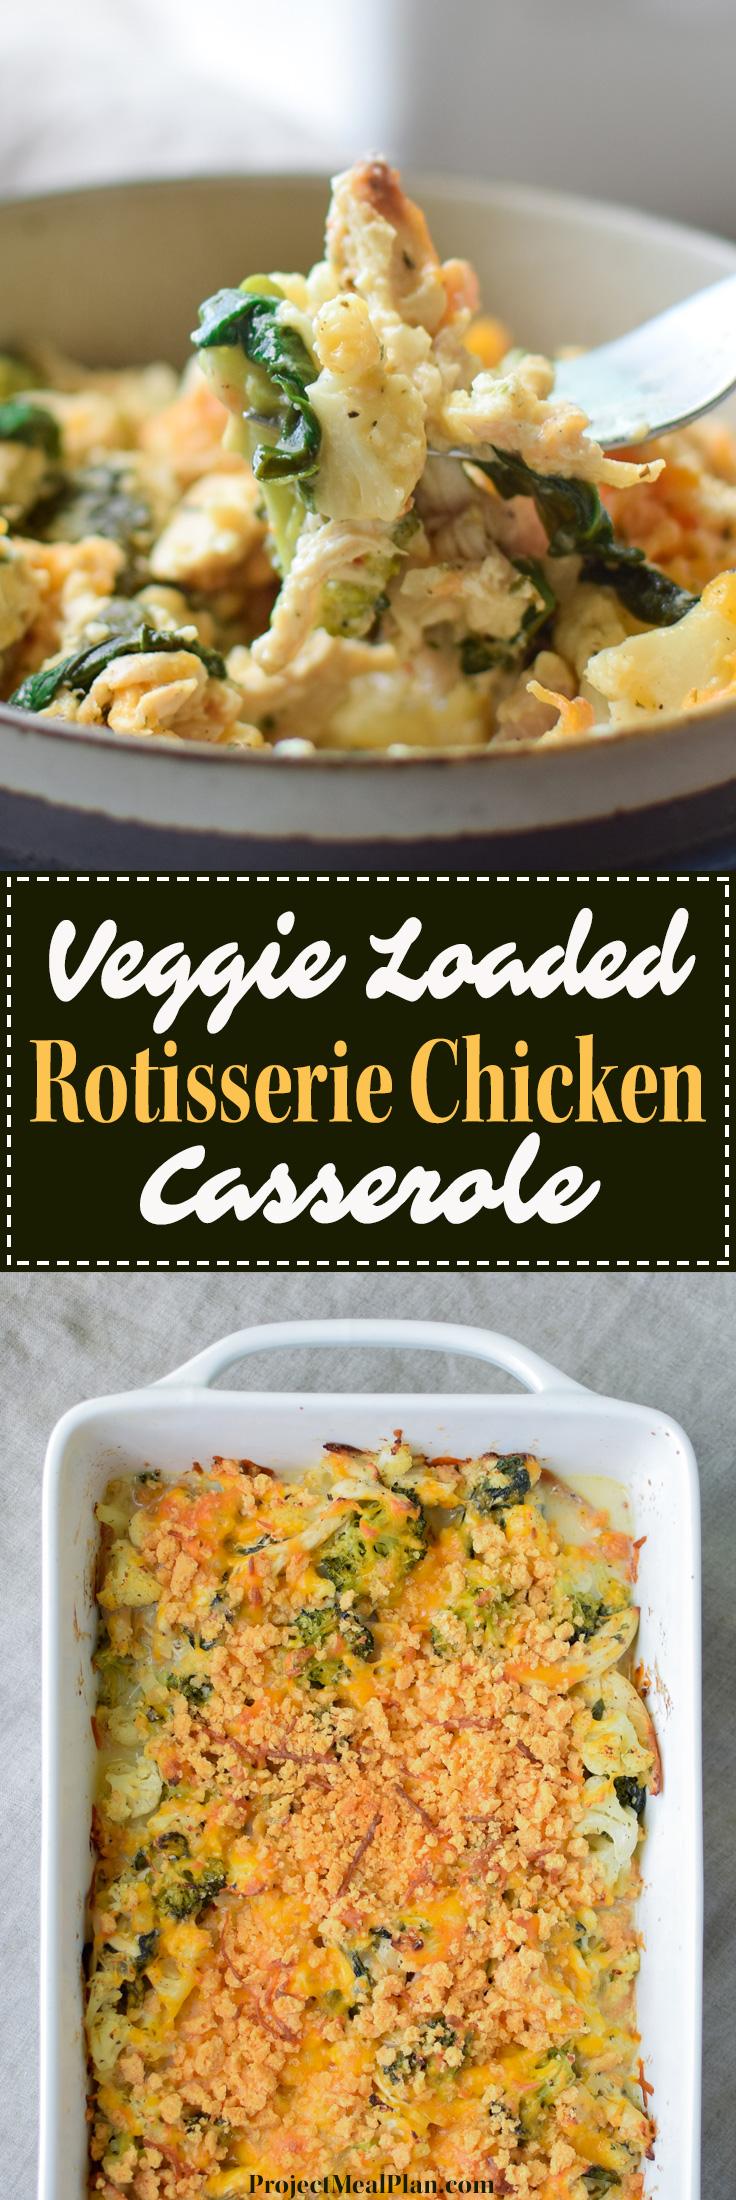 Veggie Loaded Rotisserie Chicken Casserole - Broccoli, cauliflower, spinach, onion, greek yogurt for healthy deliciousness!! - ProjectMealPlan.com